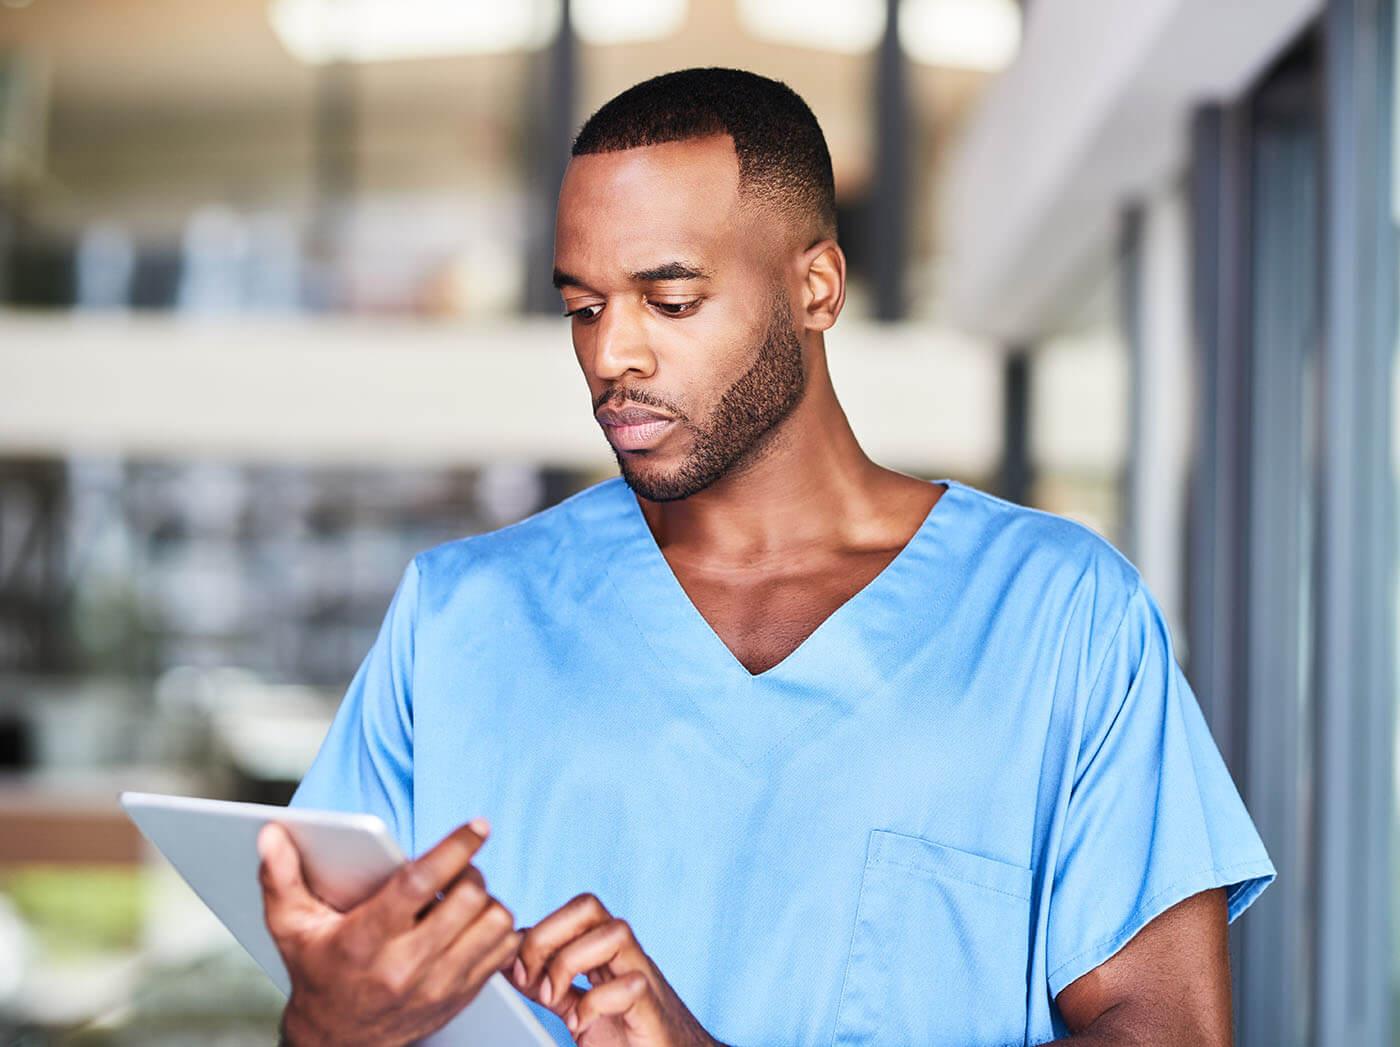 Accelerated Nurse Practitioner Programs Online